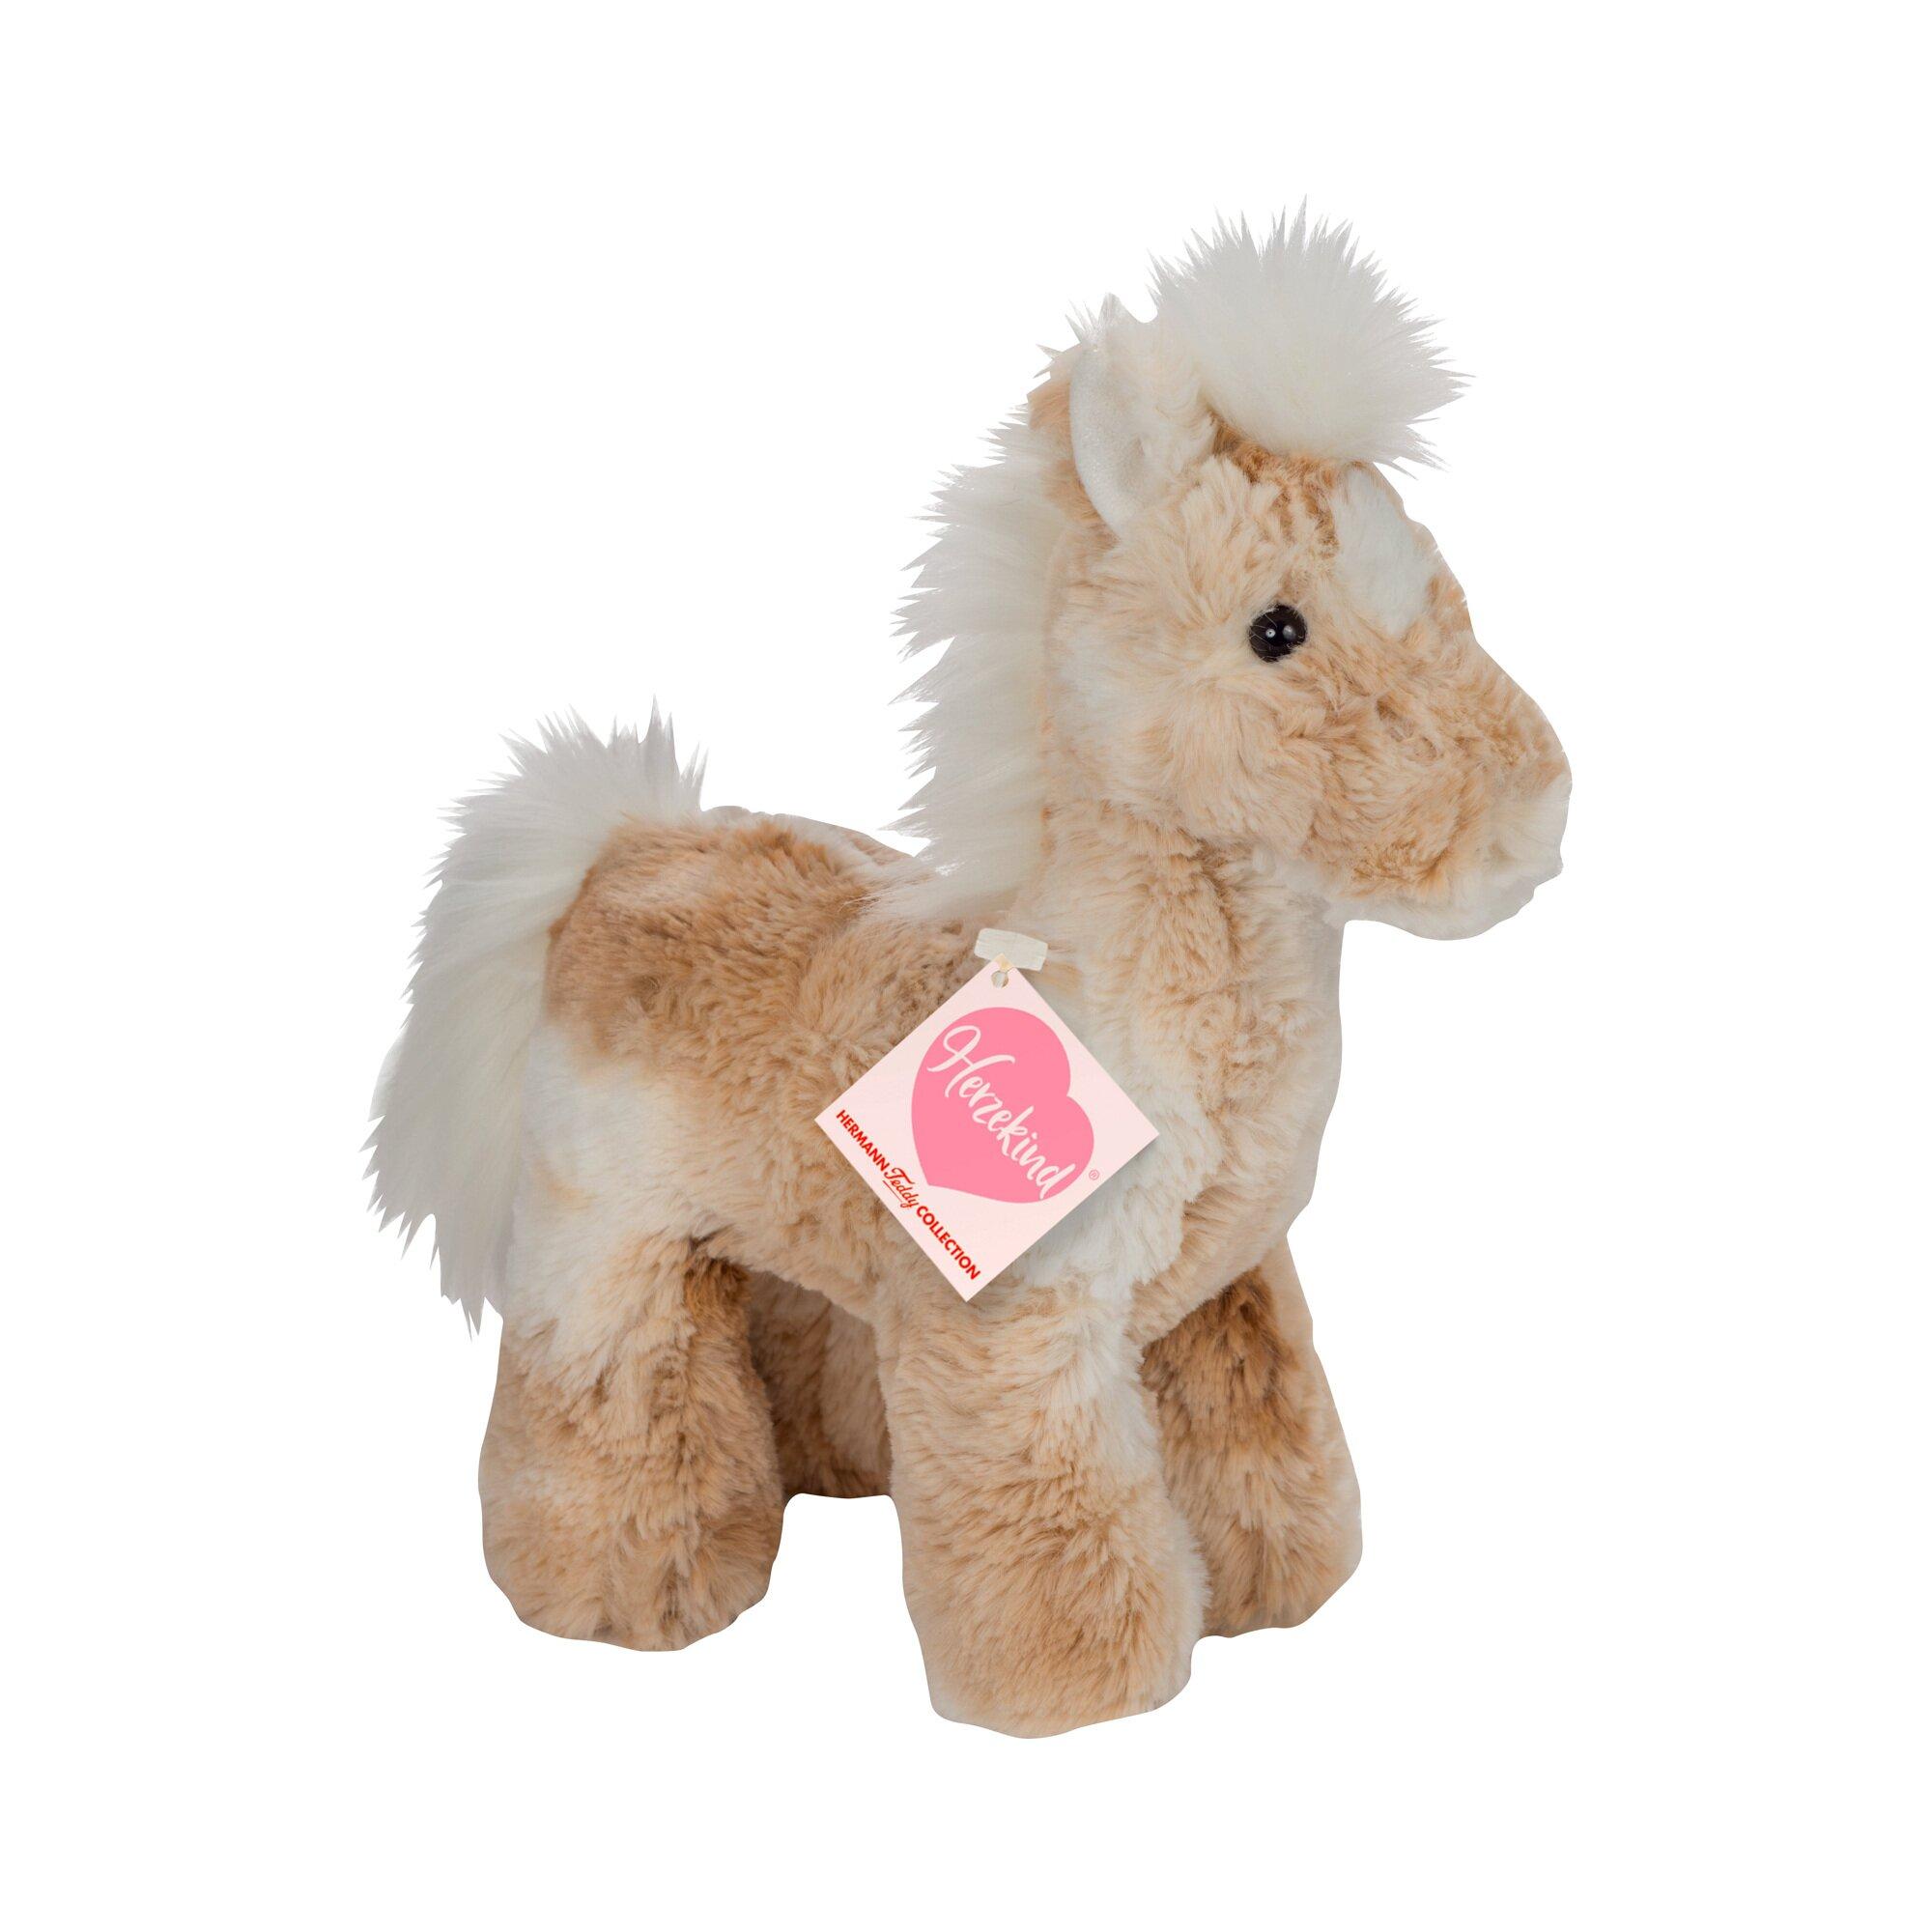 Herzekind Kuscheltier Pferd Ruby 25cm